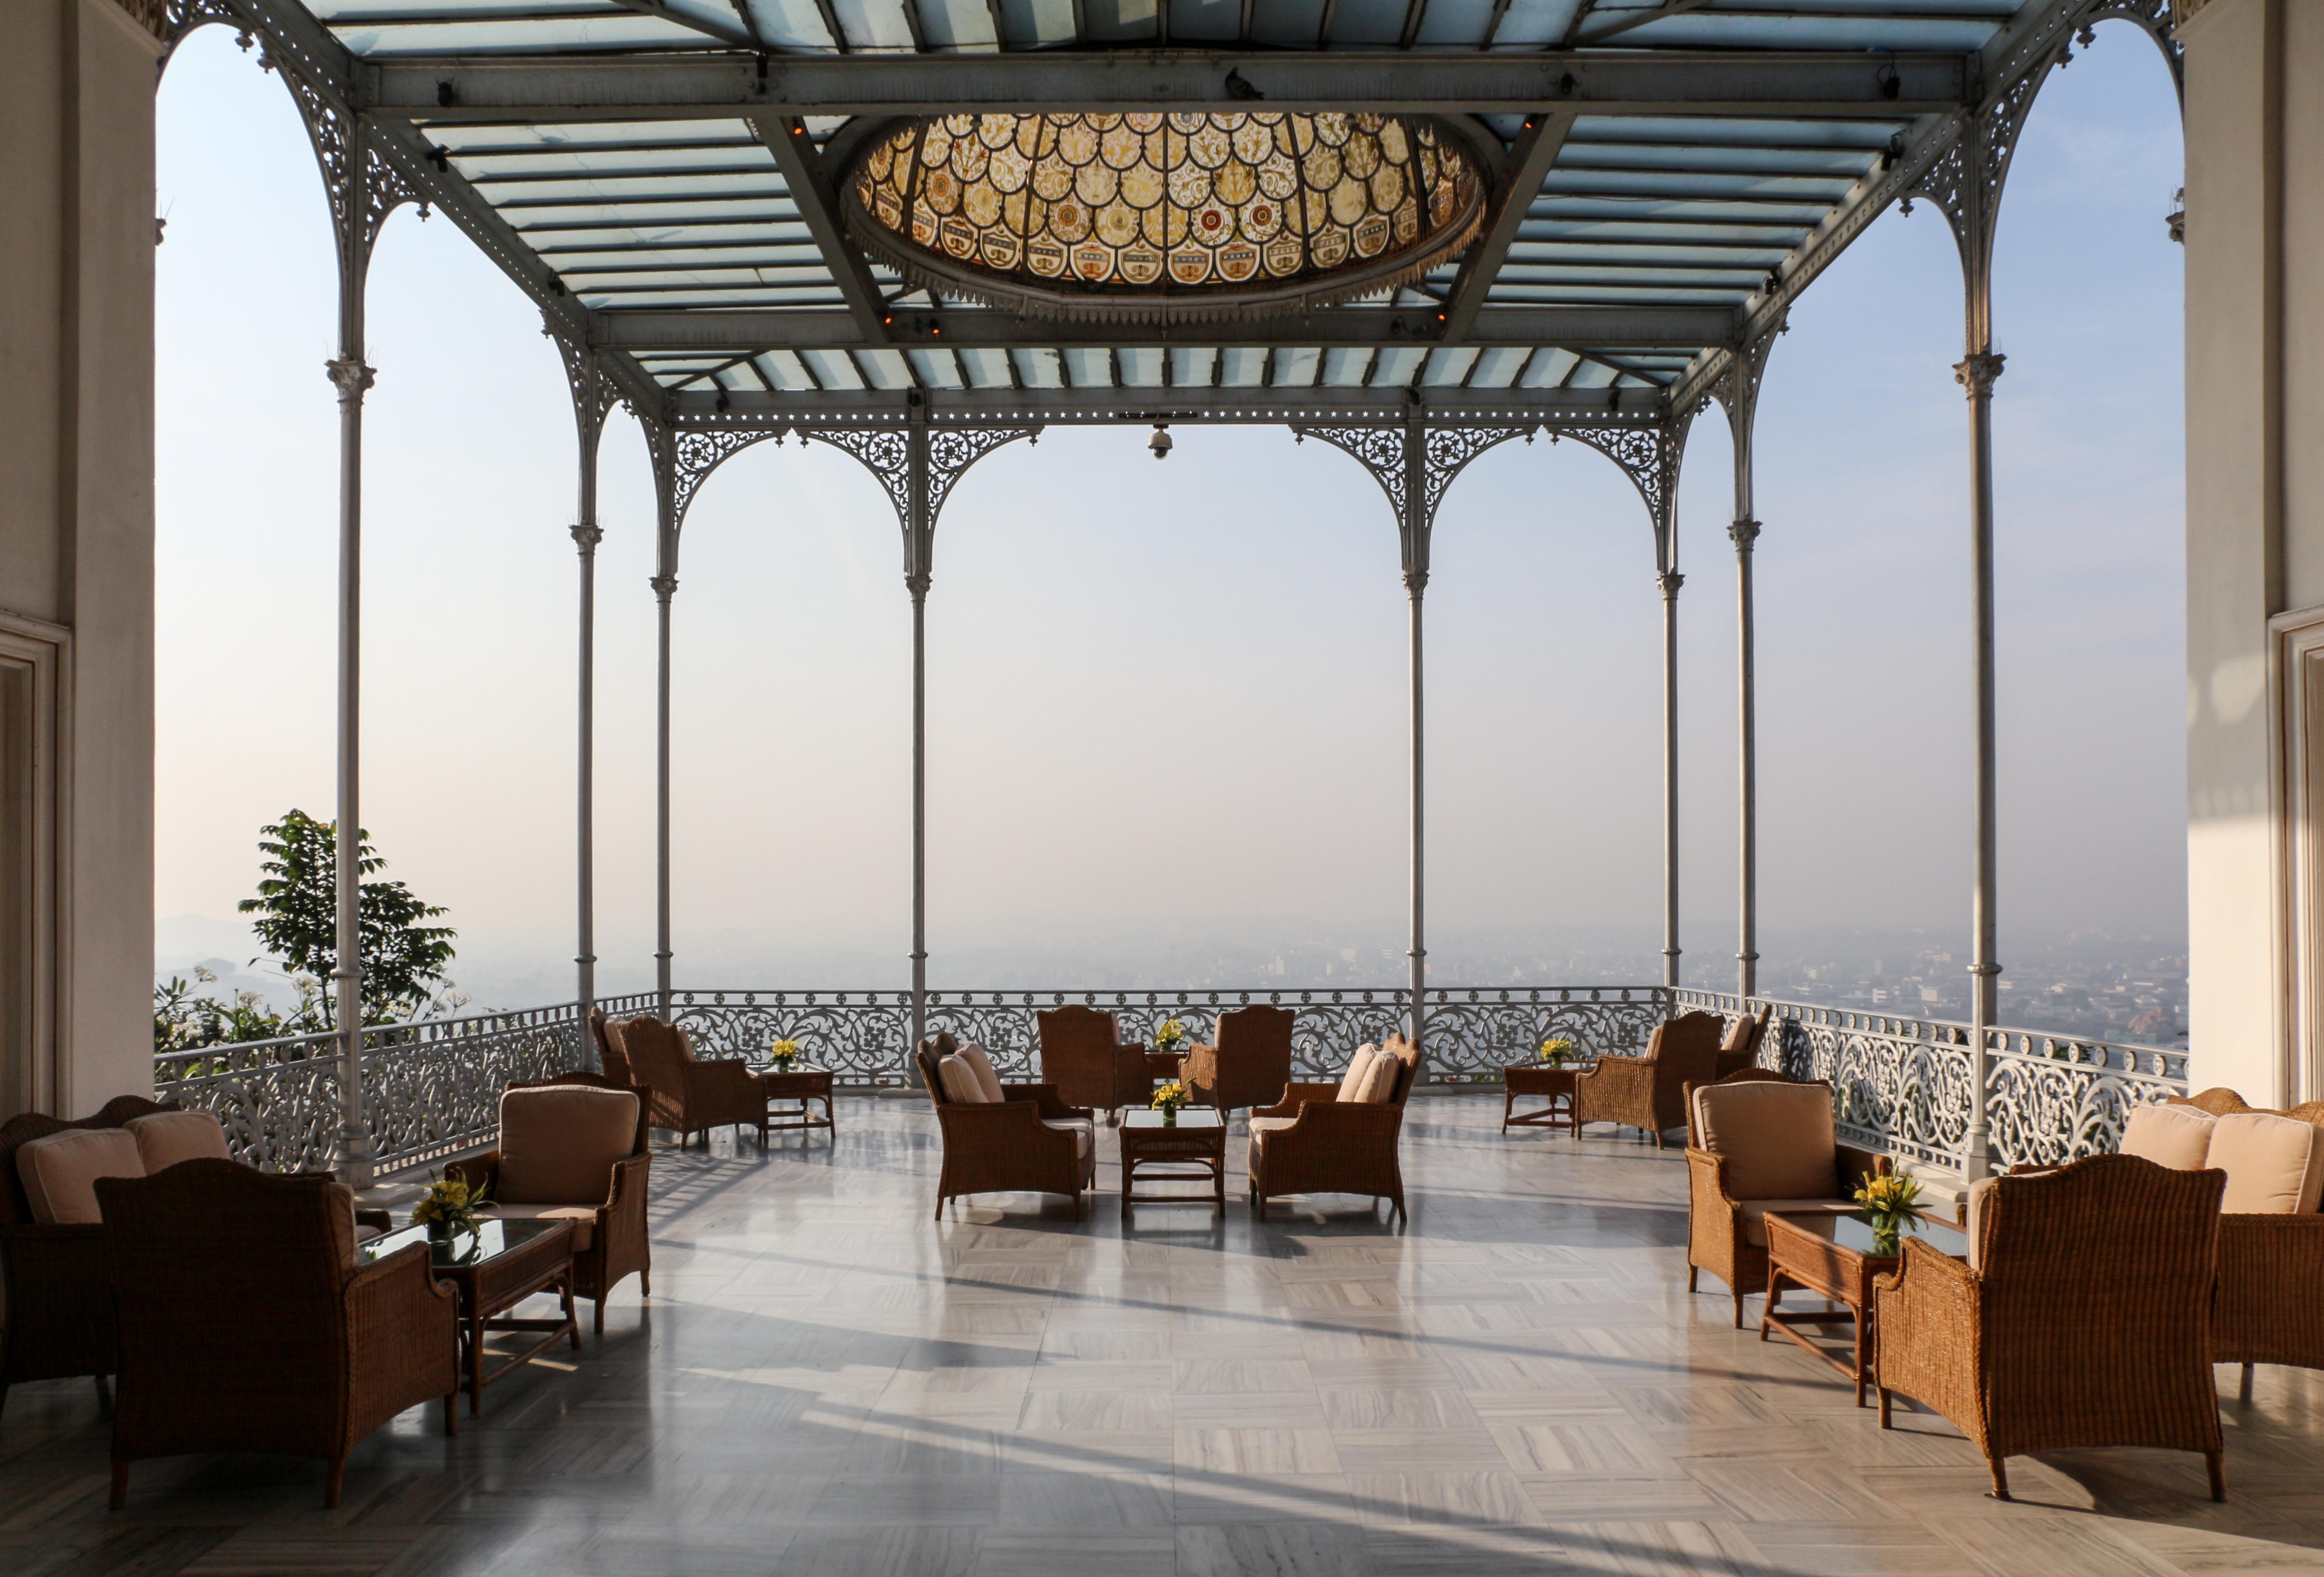 Hotel Bungalow Marrakech